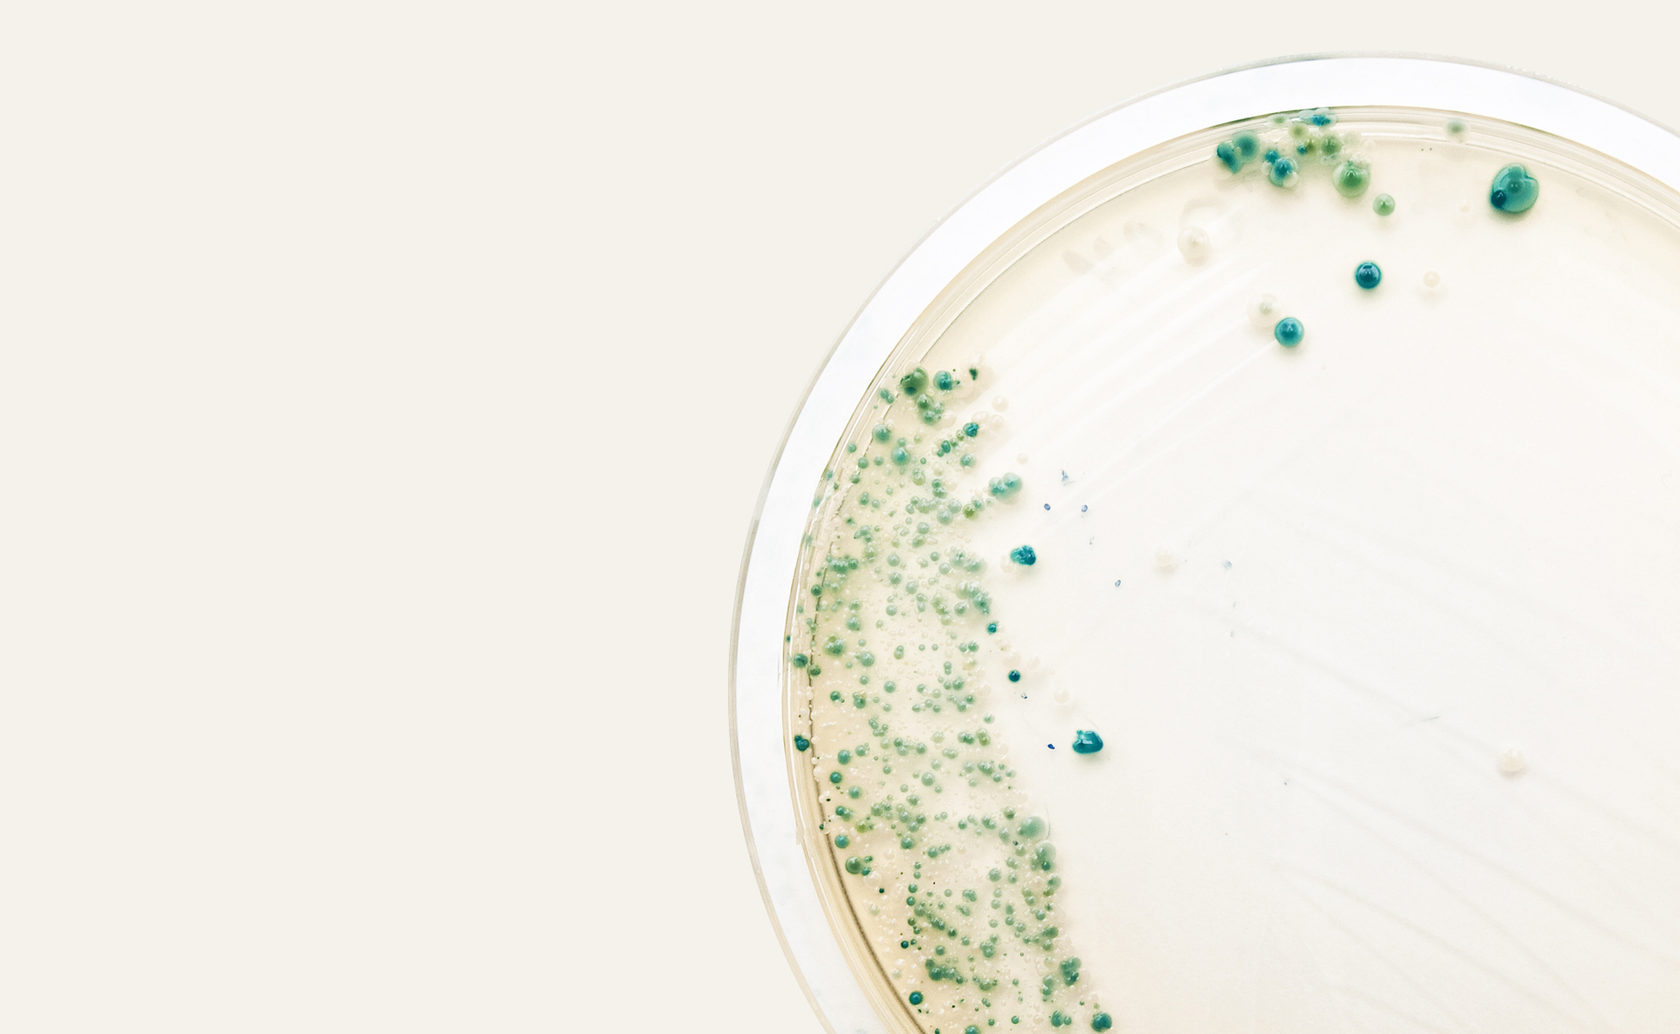 бактерии в чашке петри